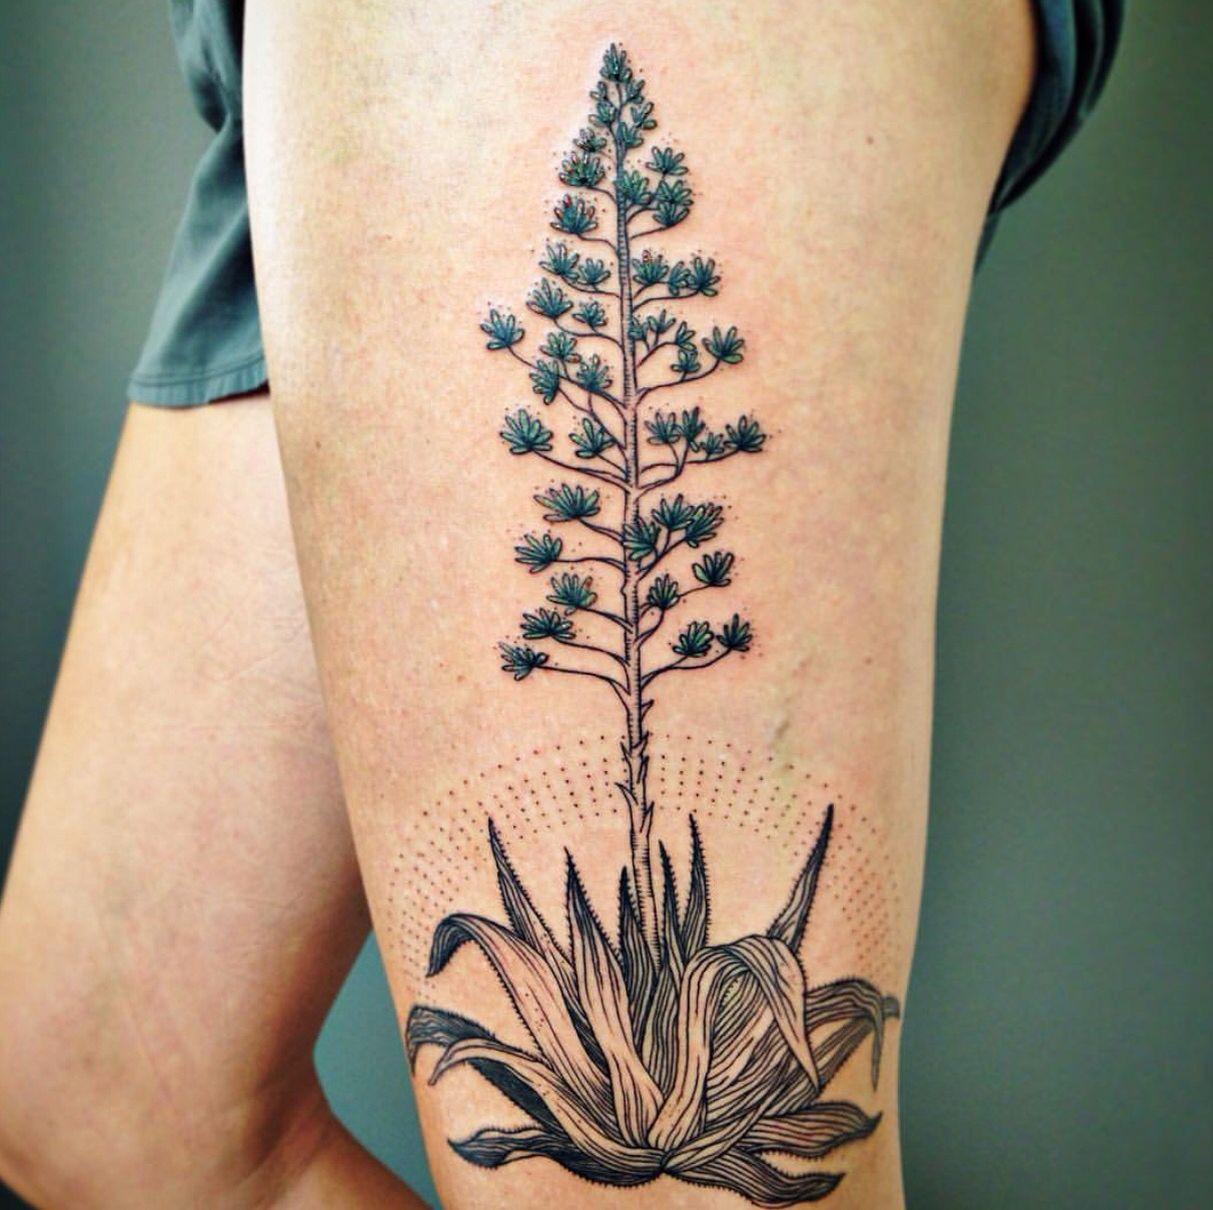 Pin by Aynur Erdem on ⚡️Tattoo Art⚡️ Plant tattoo